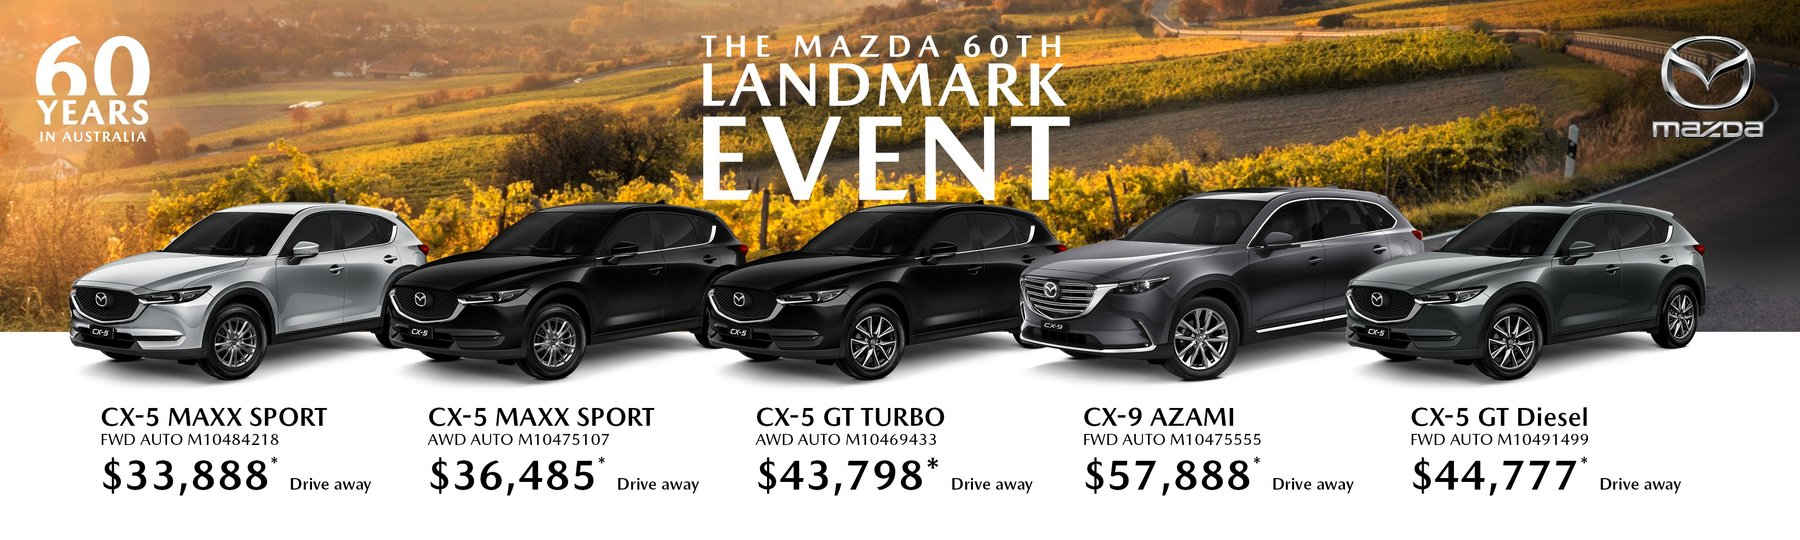 Mazda Landmark Sale Event